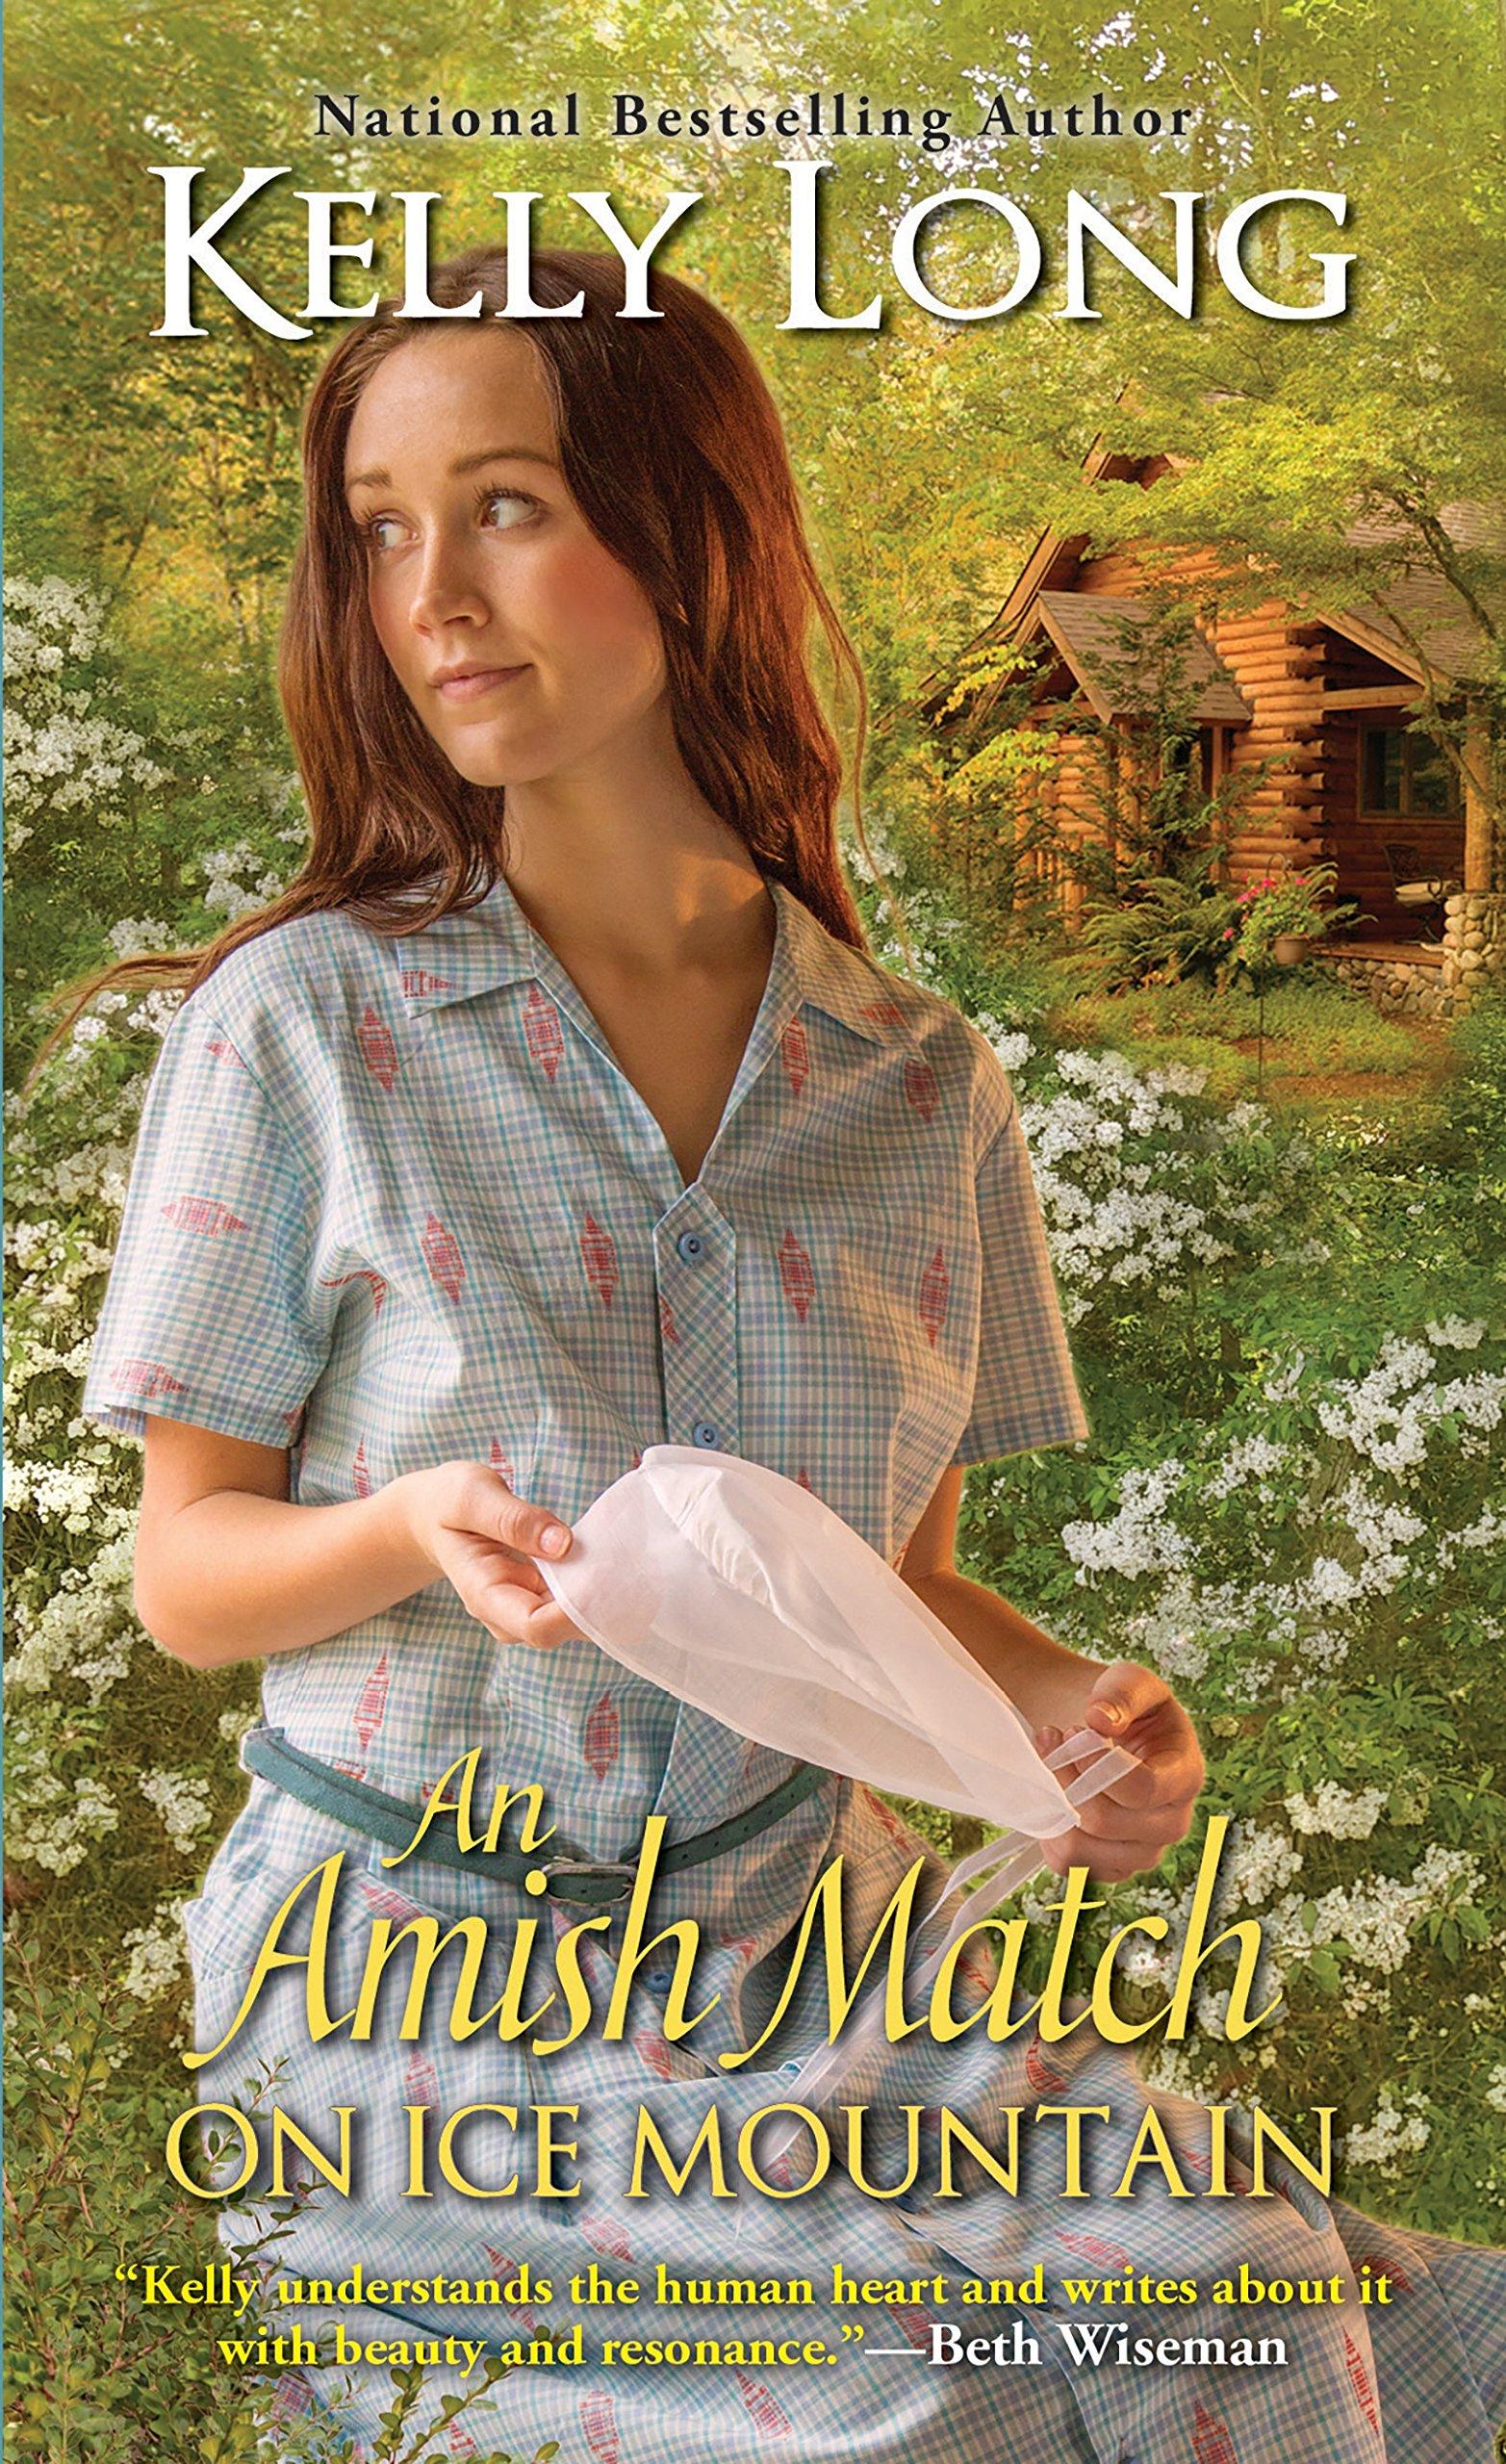 An Amish Match on Ice Mountain: Kelly Long: 9781420141276: Amazon.com: Books